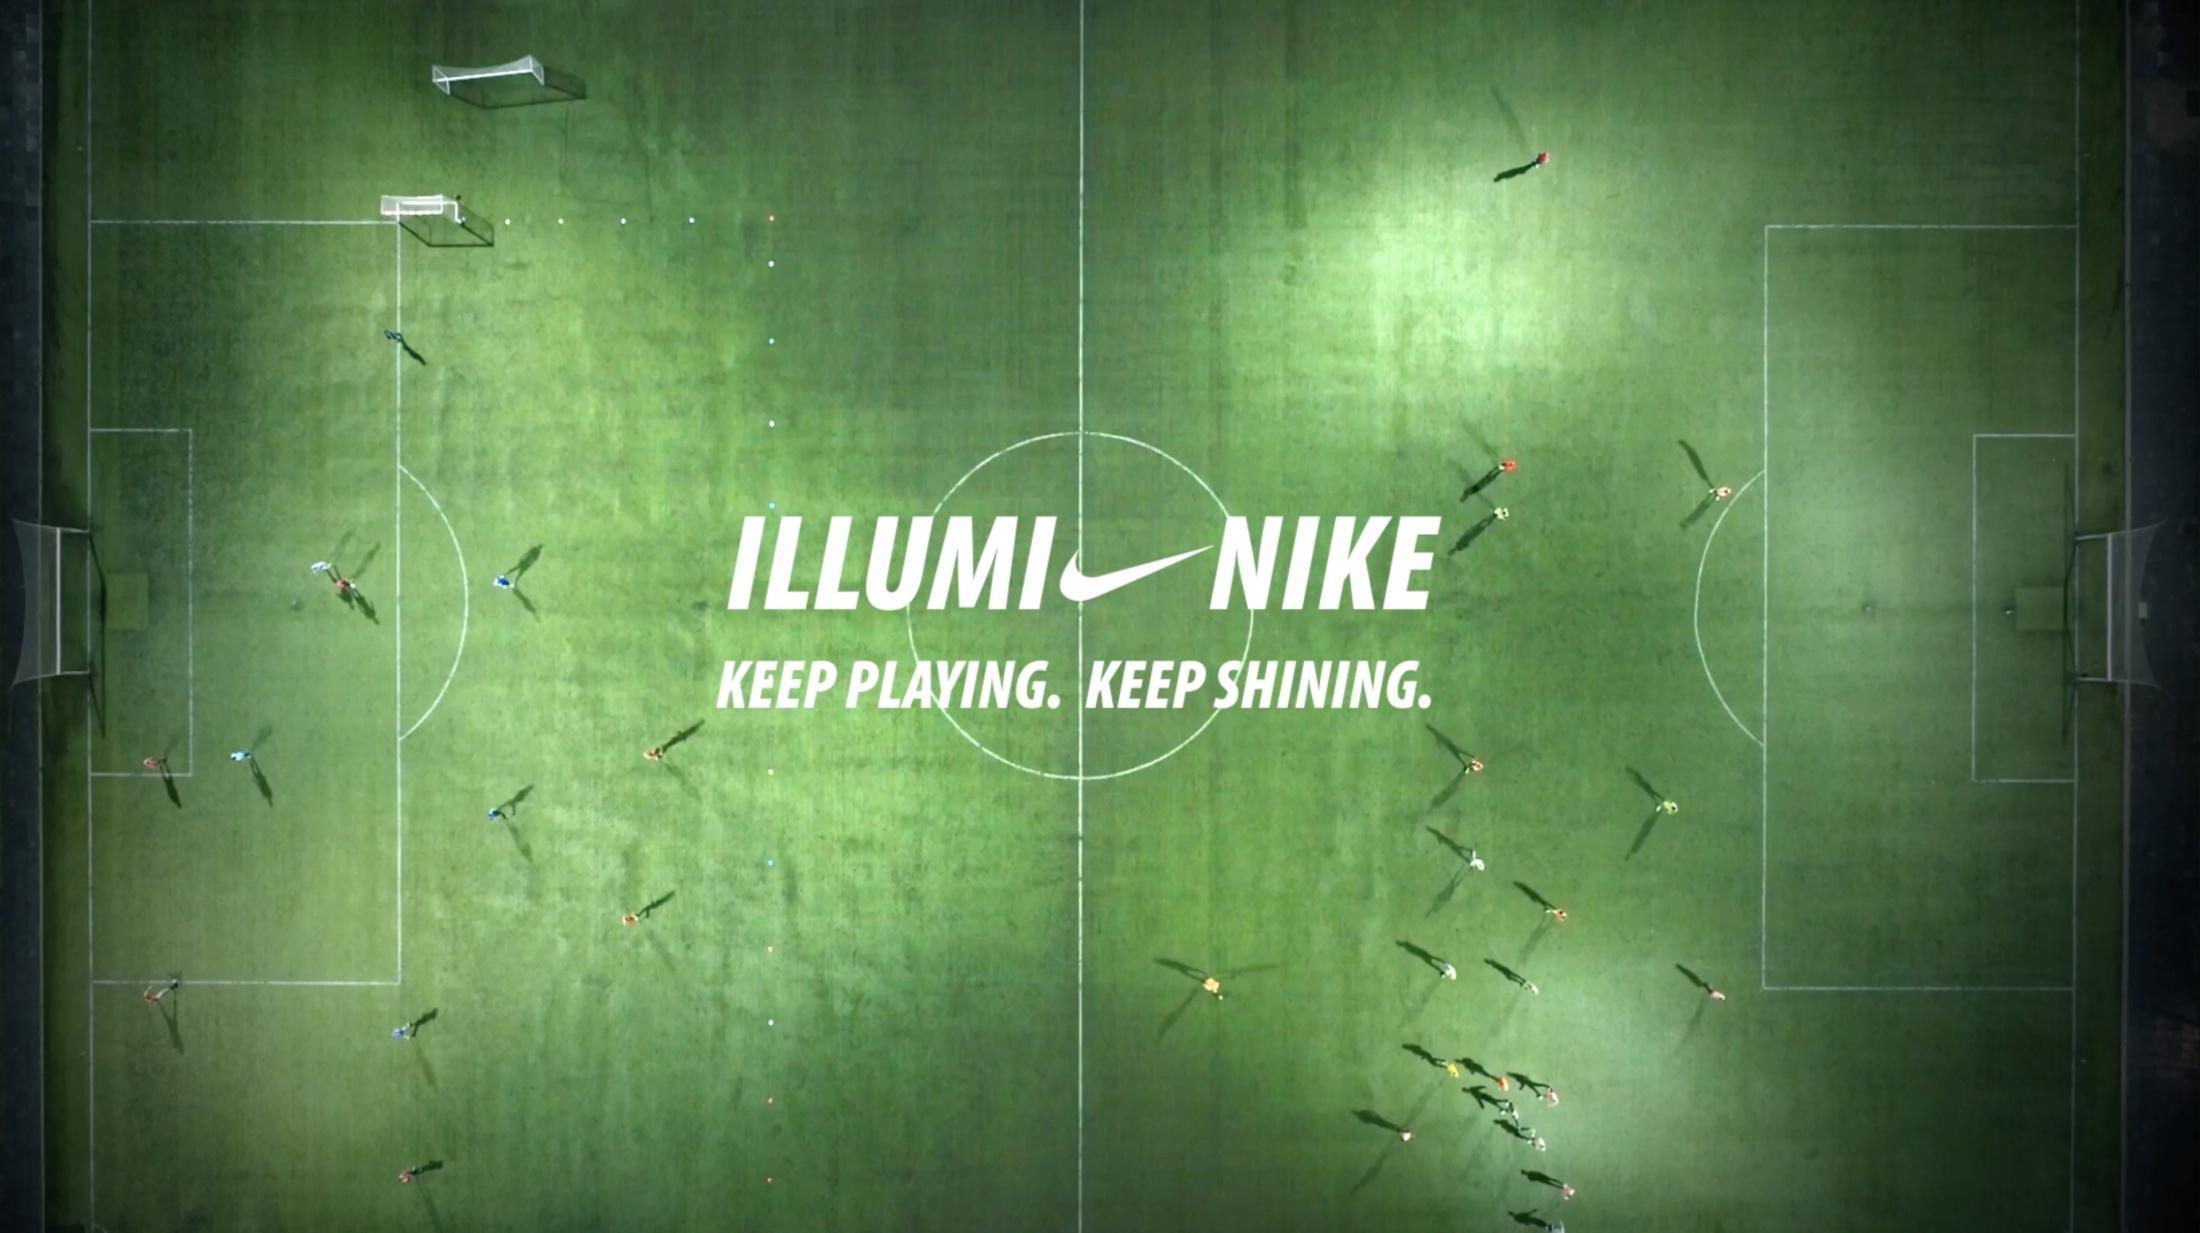 Thumbnail for ILLUMINIKE